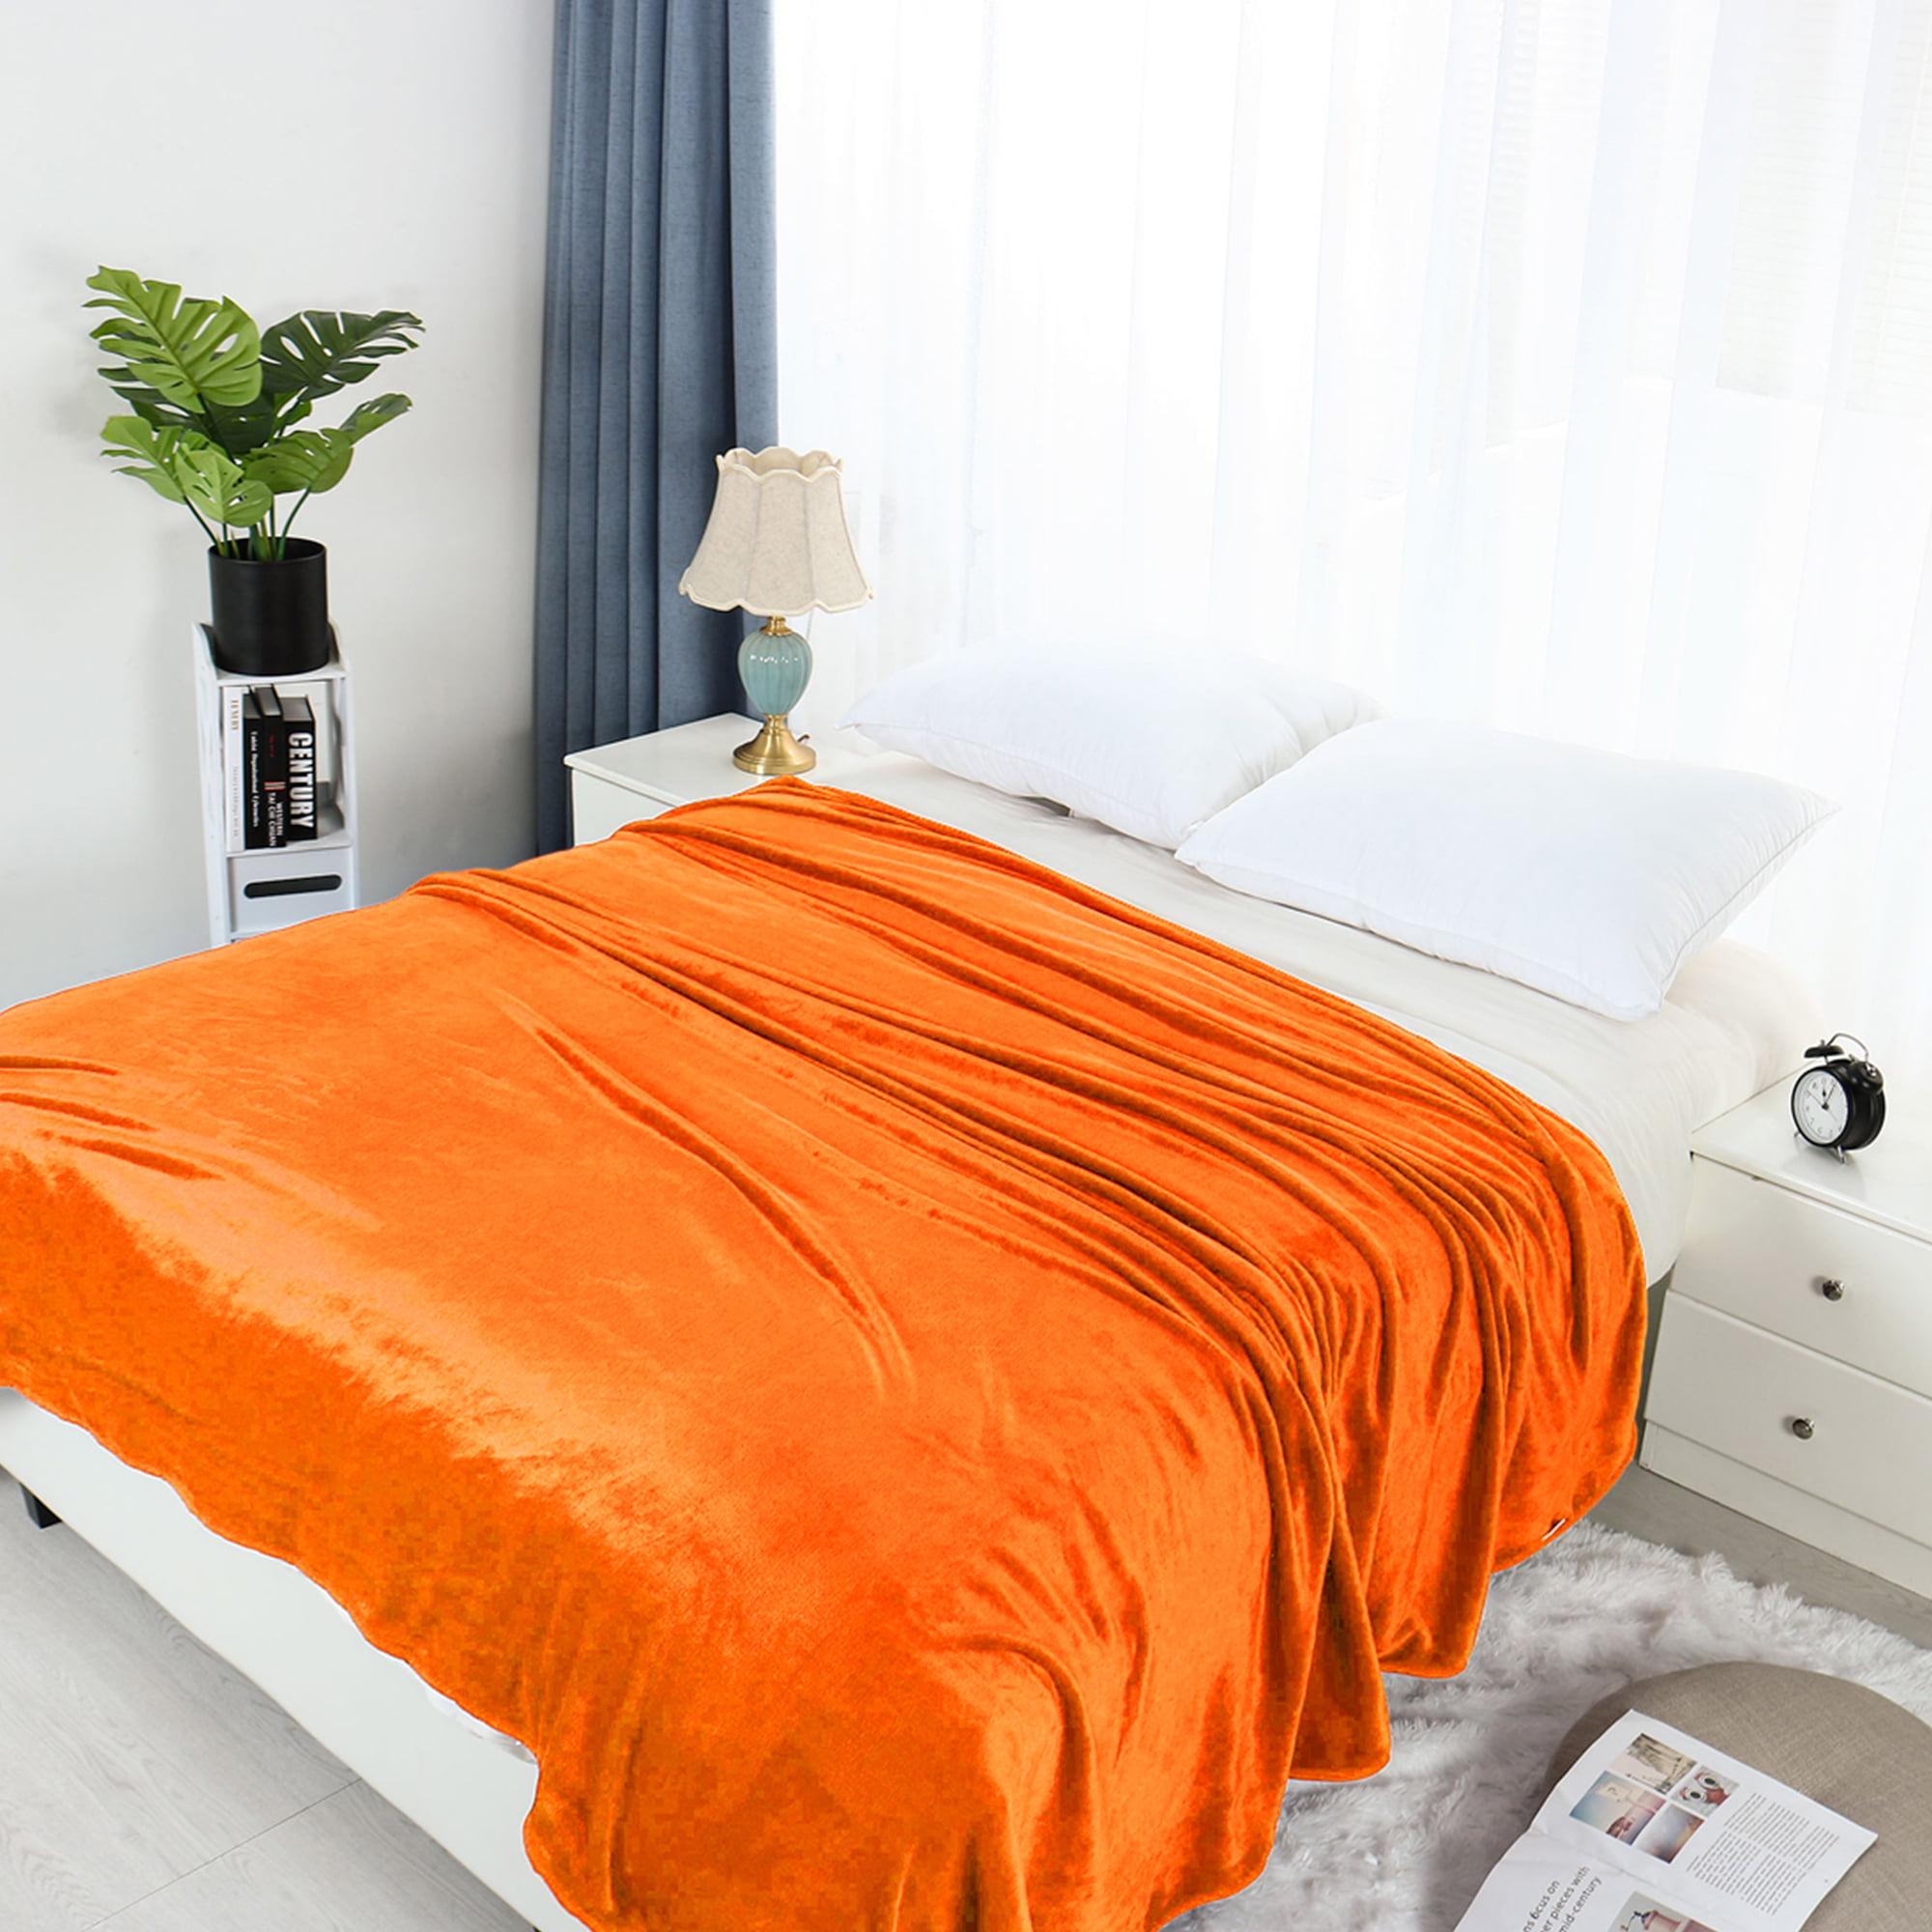 Home Bedroom All Season Lightweight Soft Warm Fuzzy Microplush Fleece Bed Blanket Orange King 90 X 108 Walmart Com Walmart Com